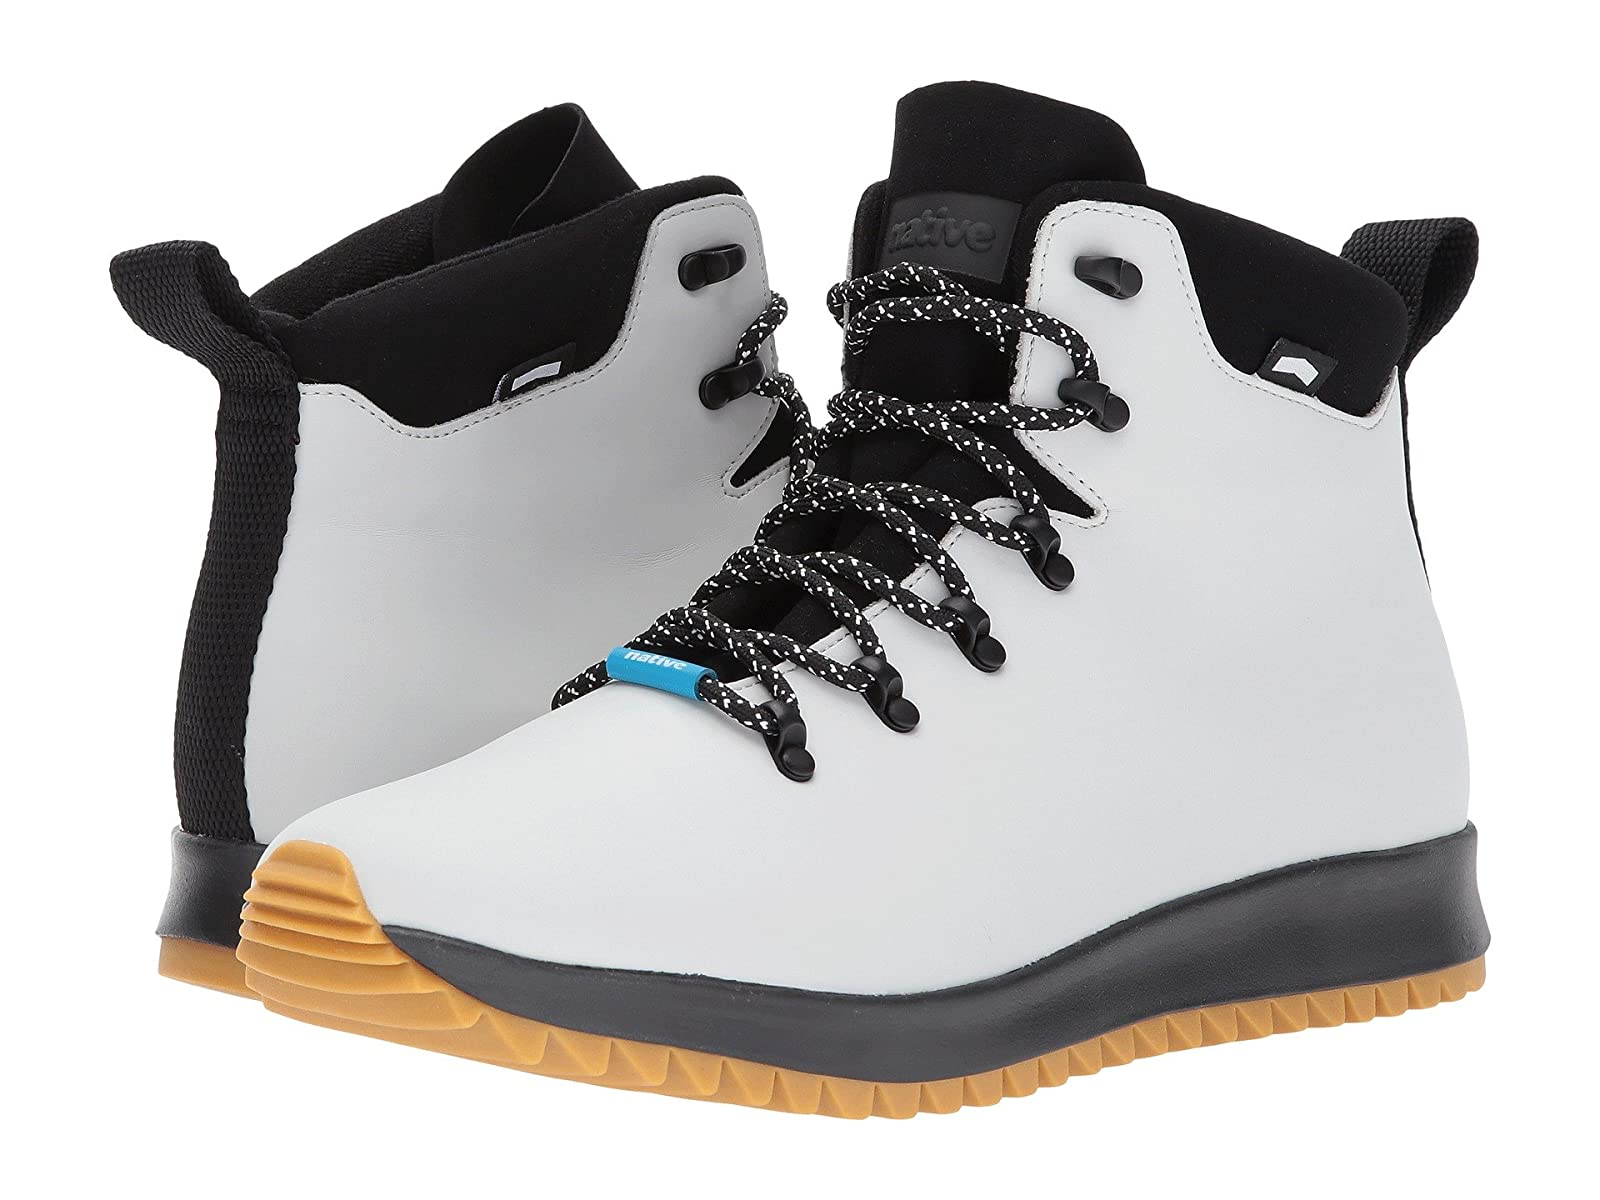 Native Shoes AP Apex CTEconomical and quality shoes